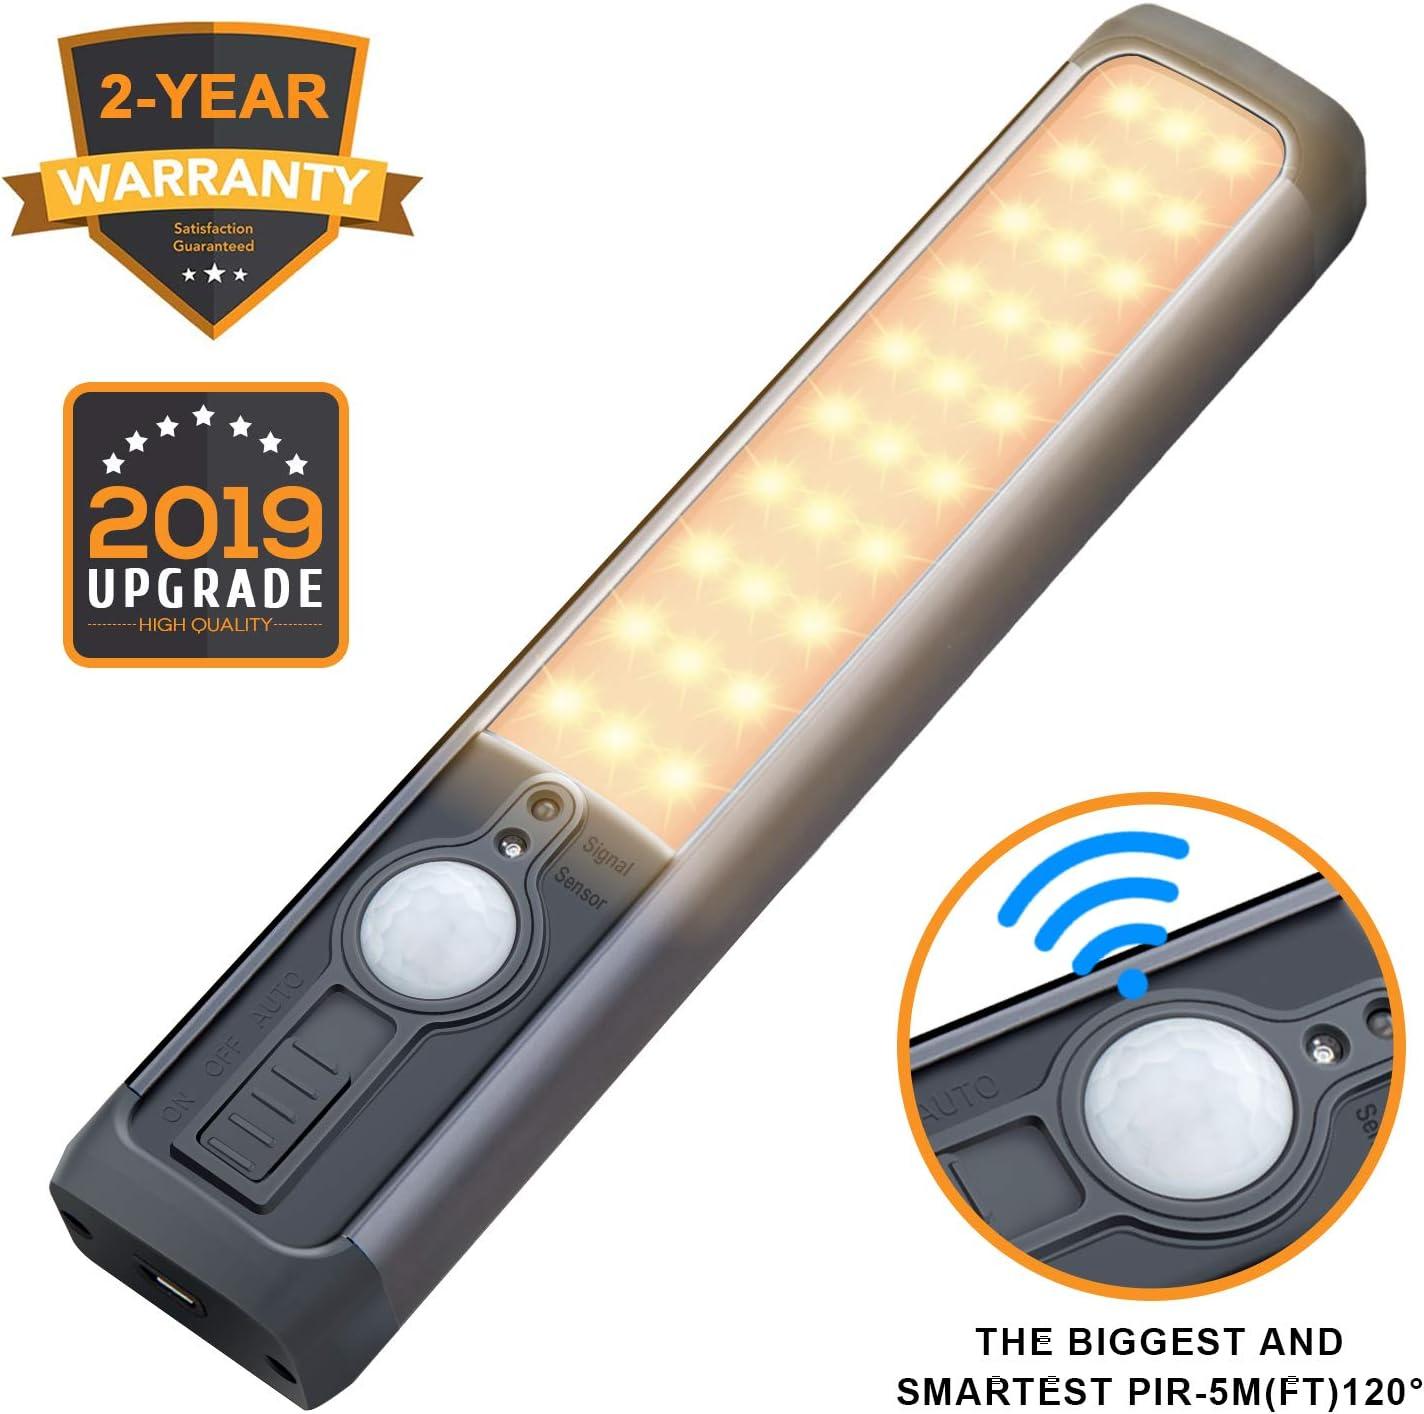 30 LED Closet light 2W Motion sensor closet lights rechargeable under cabinet lighting wireless wardrobe light for Closet Warm white 1600mAh battery Powered closet light bar 3 Mode-ON/OFF/Motion&Light